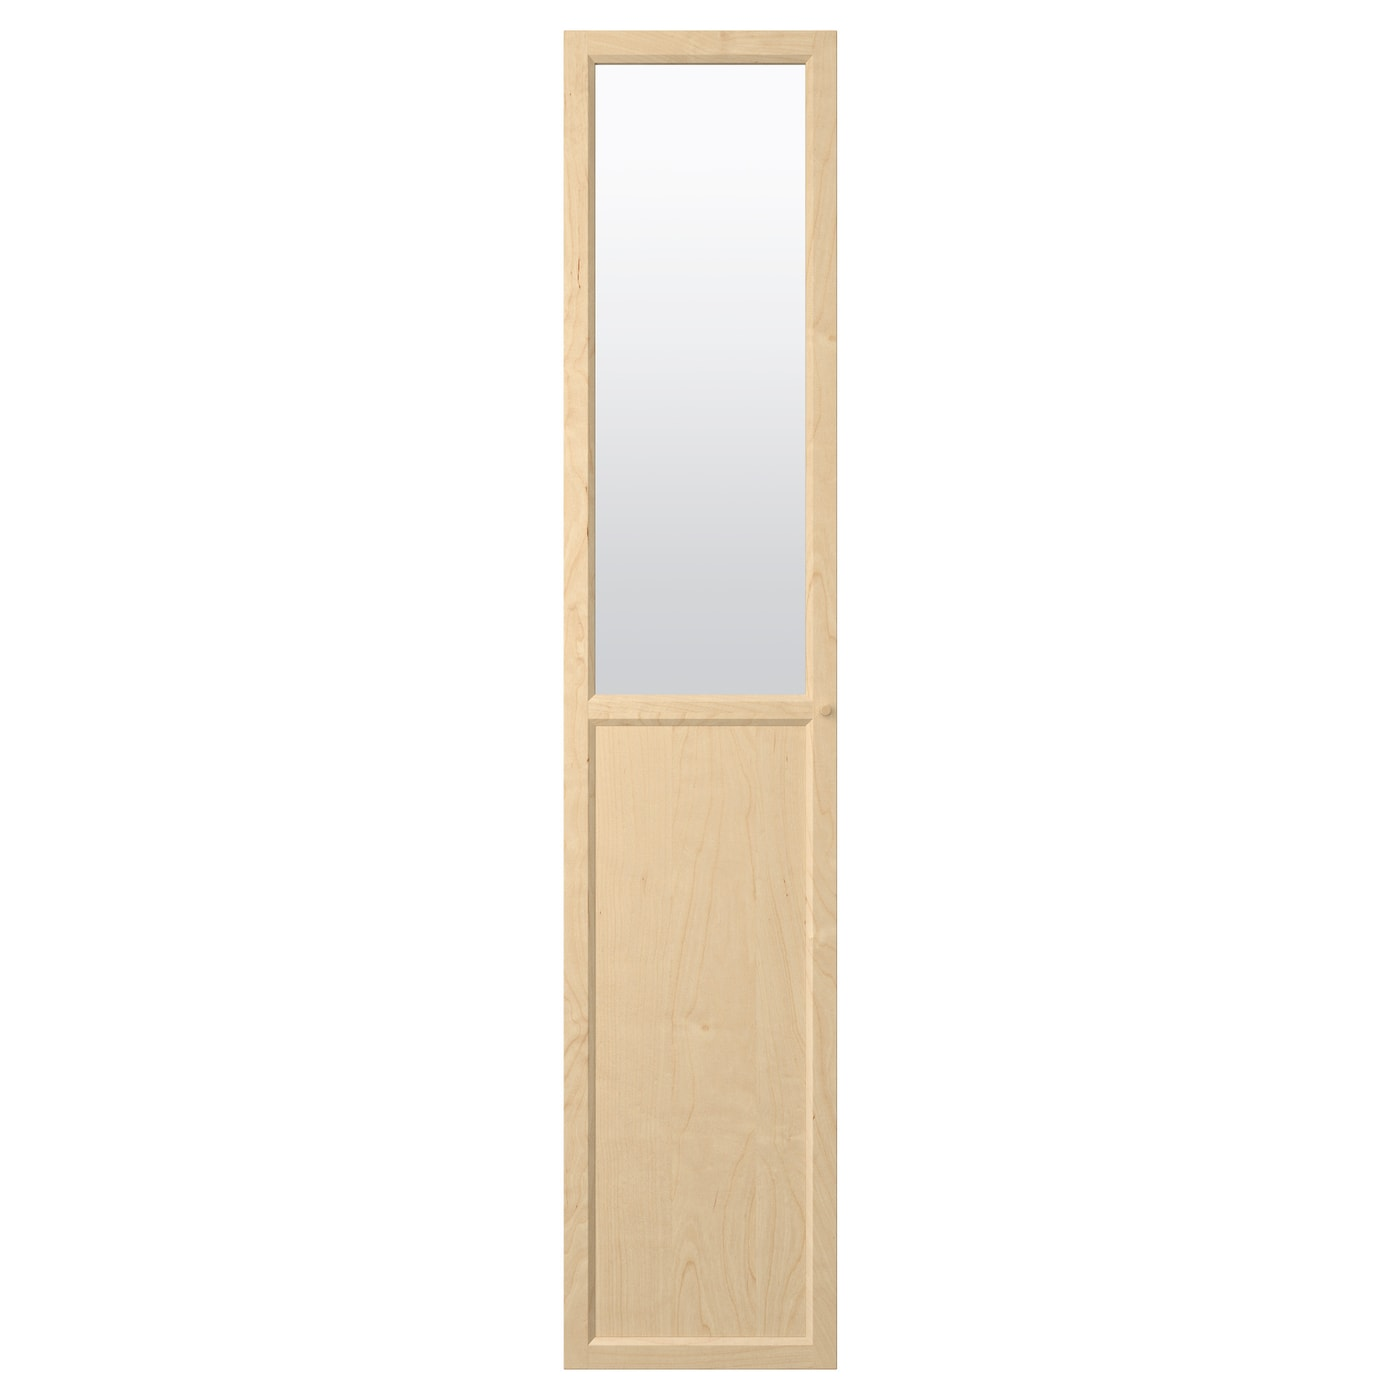 oxberg panneau porte vitr e plaqu bouleau 40x192 cm ikea. Black Bedroom Furniture Sets. Home Design Ideas